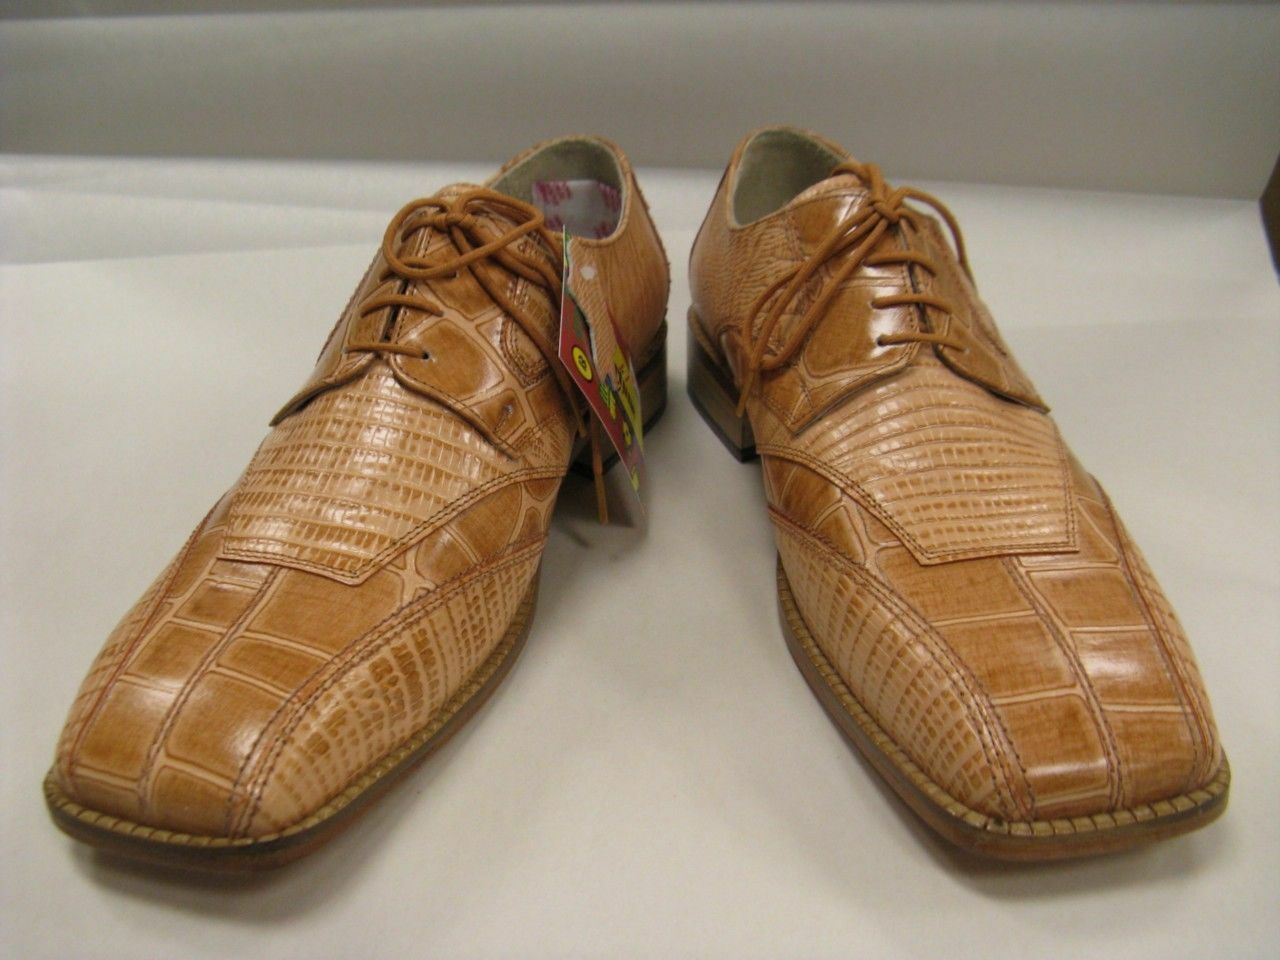 Men's Liberty Rust Color Croco Lizard Print Leather Dress Shoes 463 901 $99